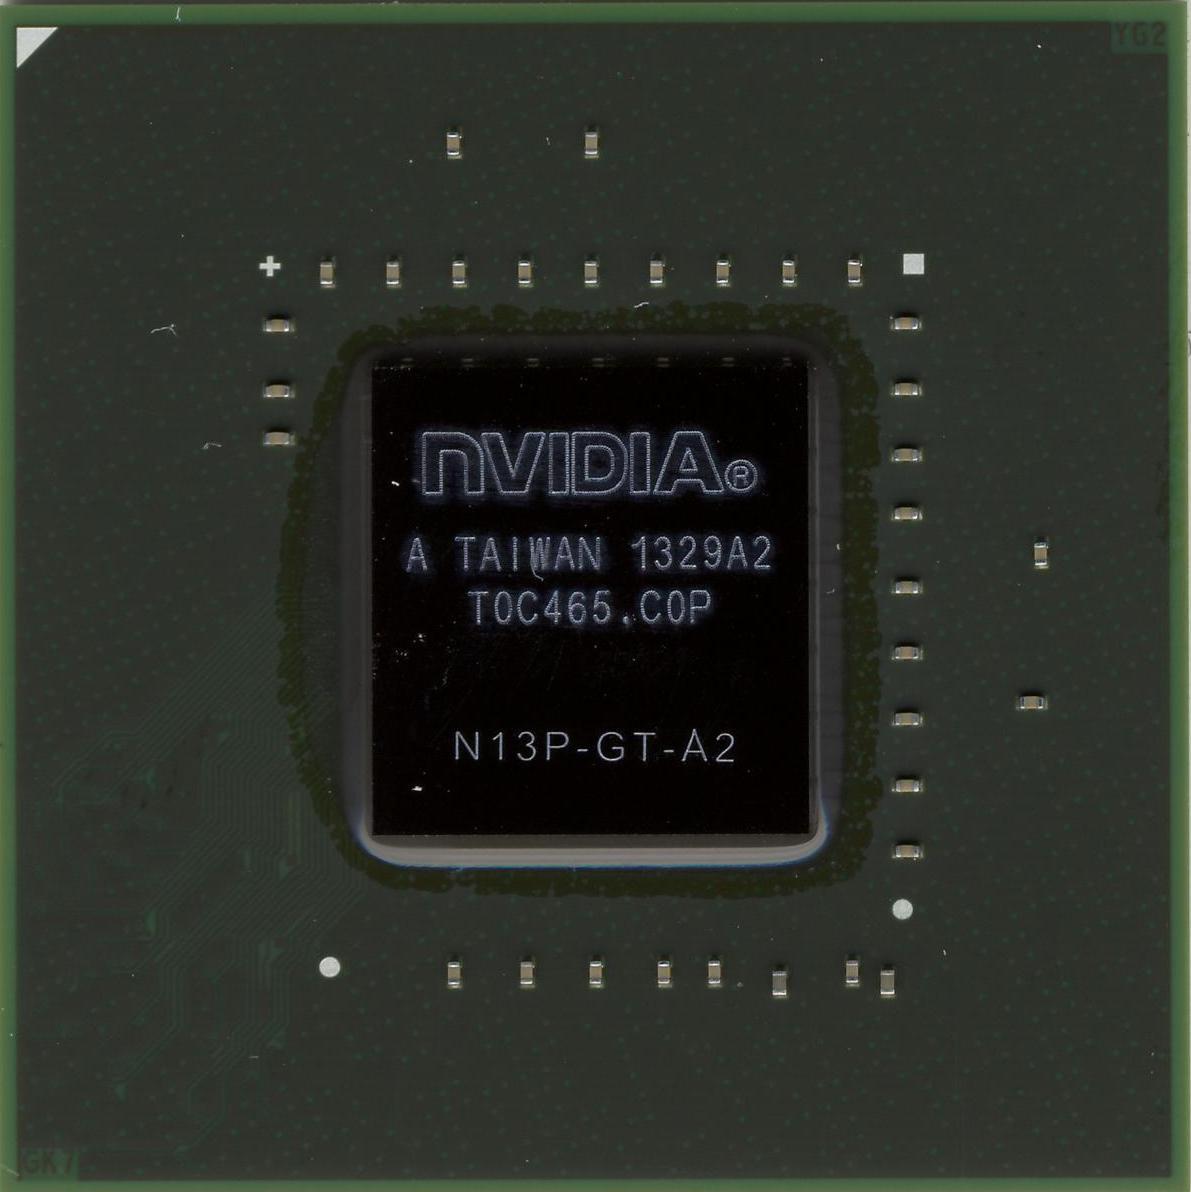 N13P-GT-A2